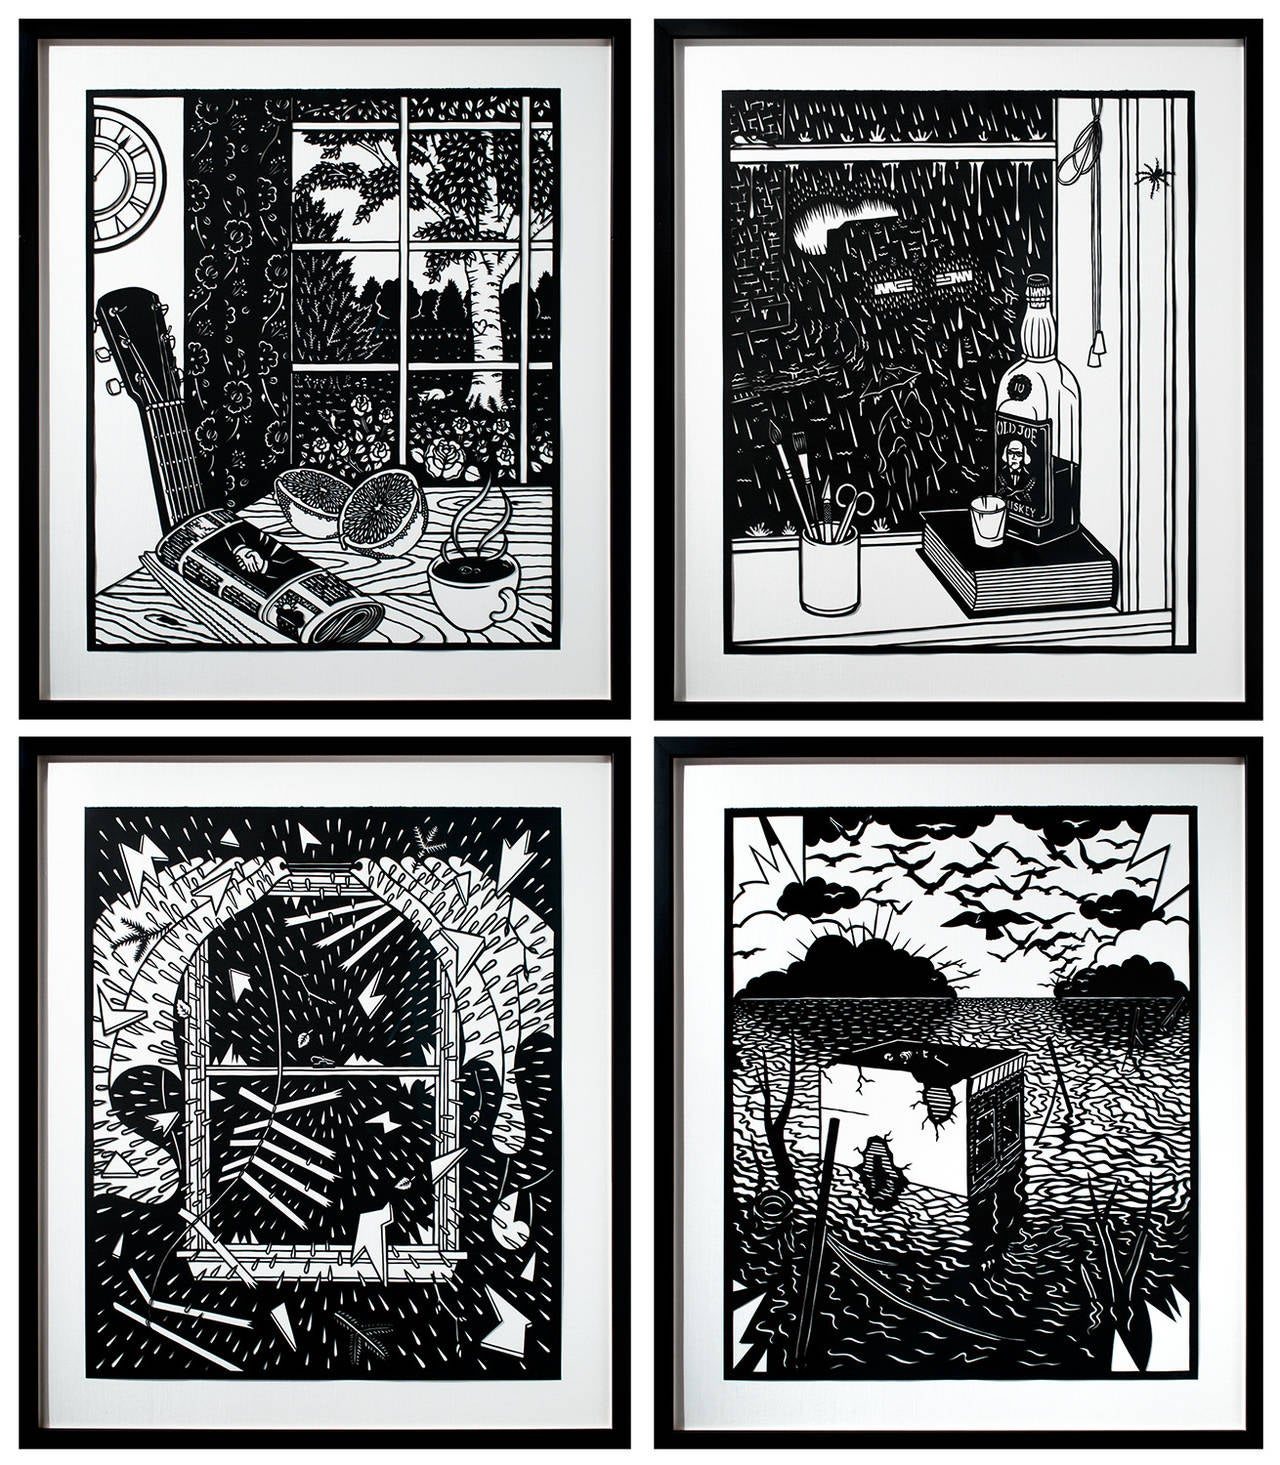 Vanitas: The Deluge - Full Series of Four